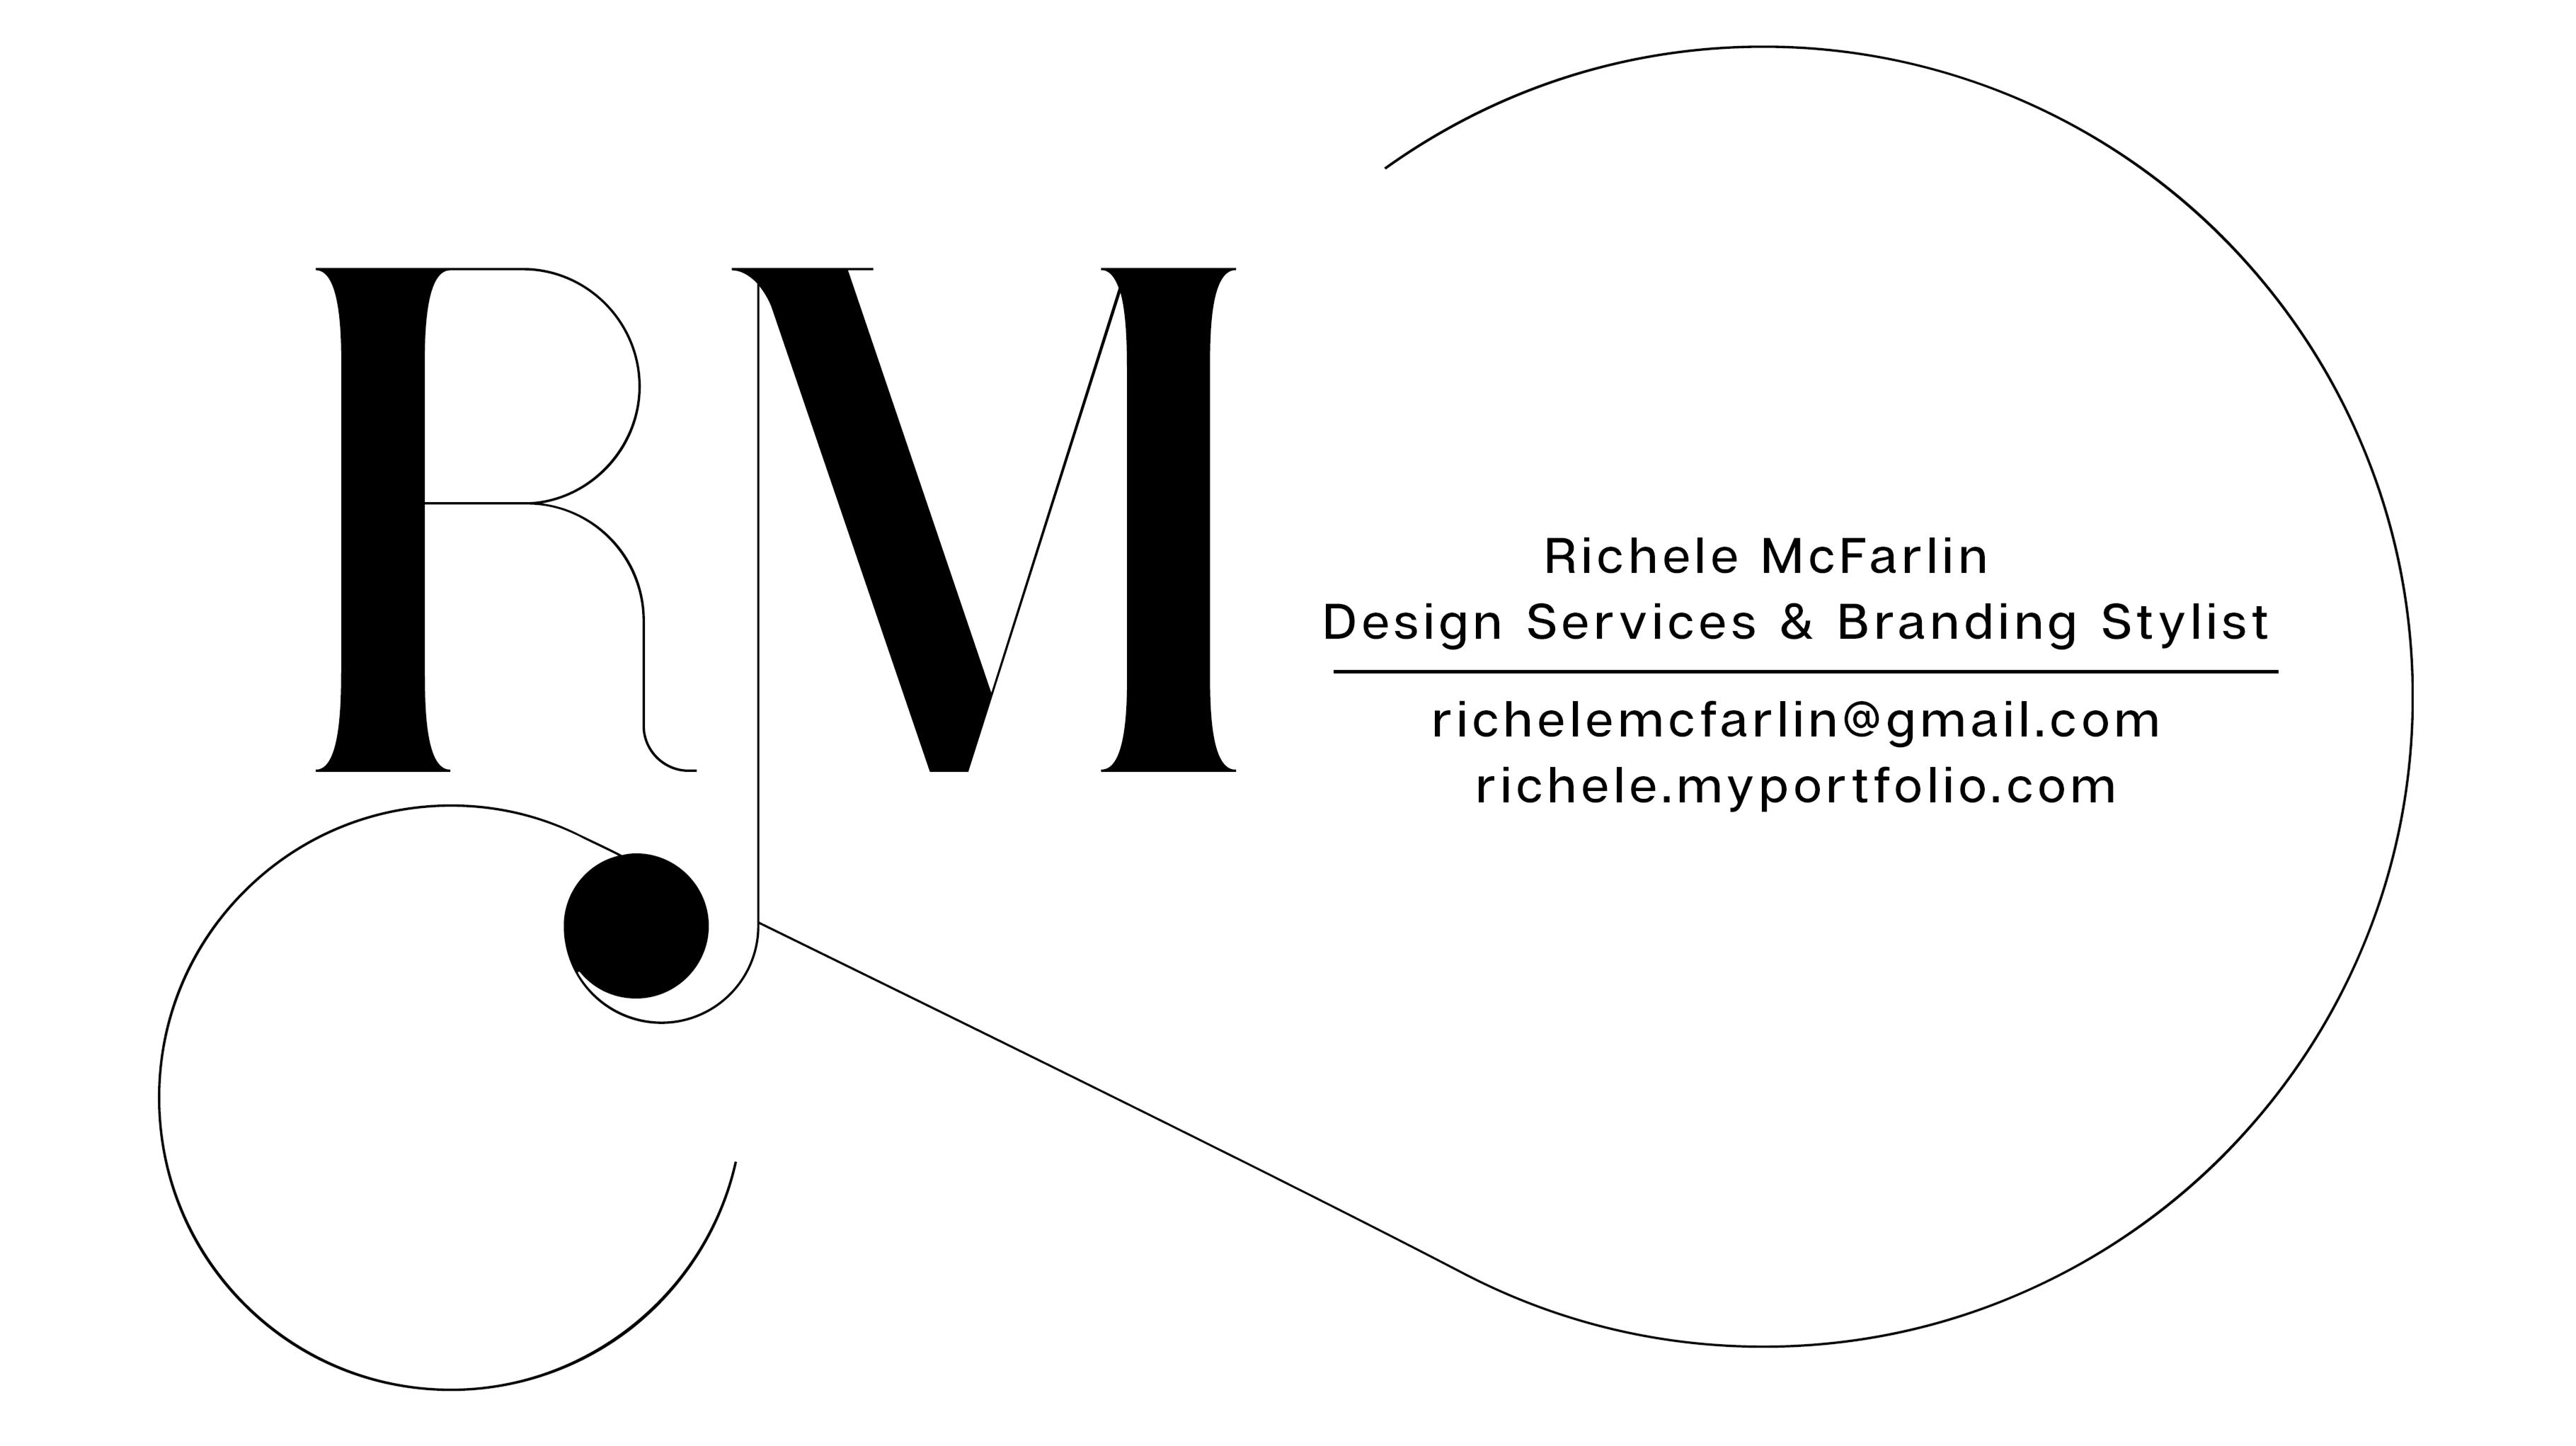 Richele McFarlin